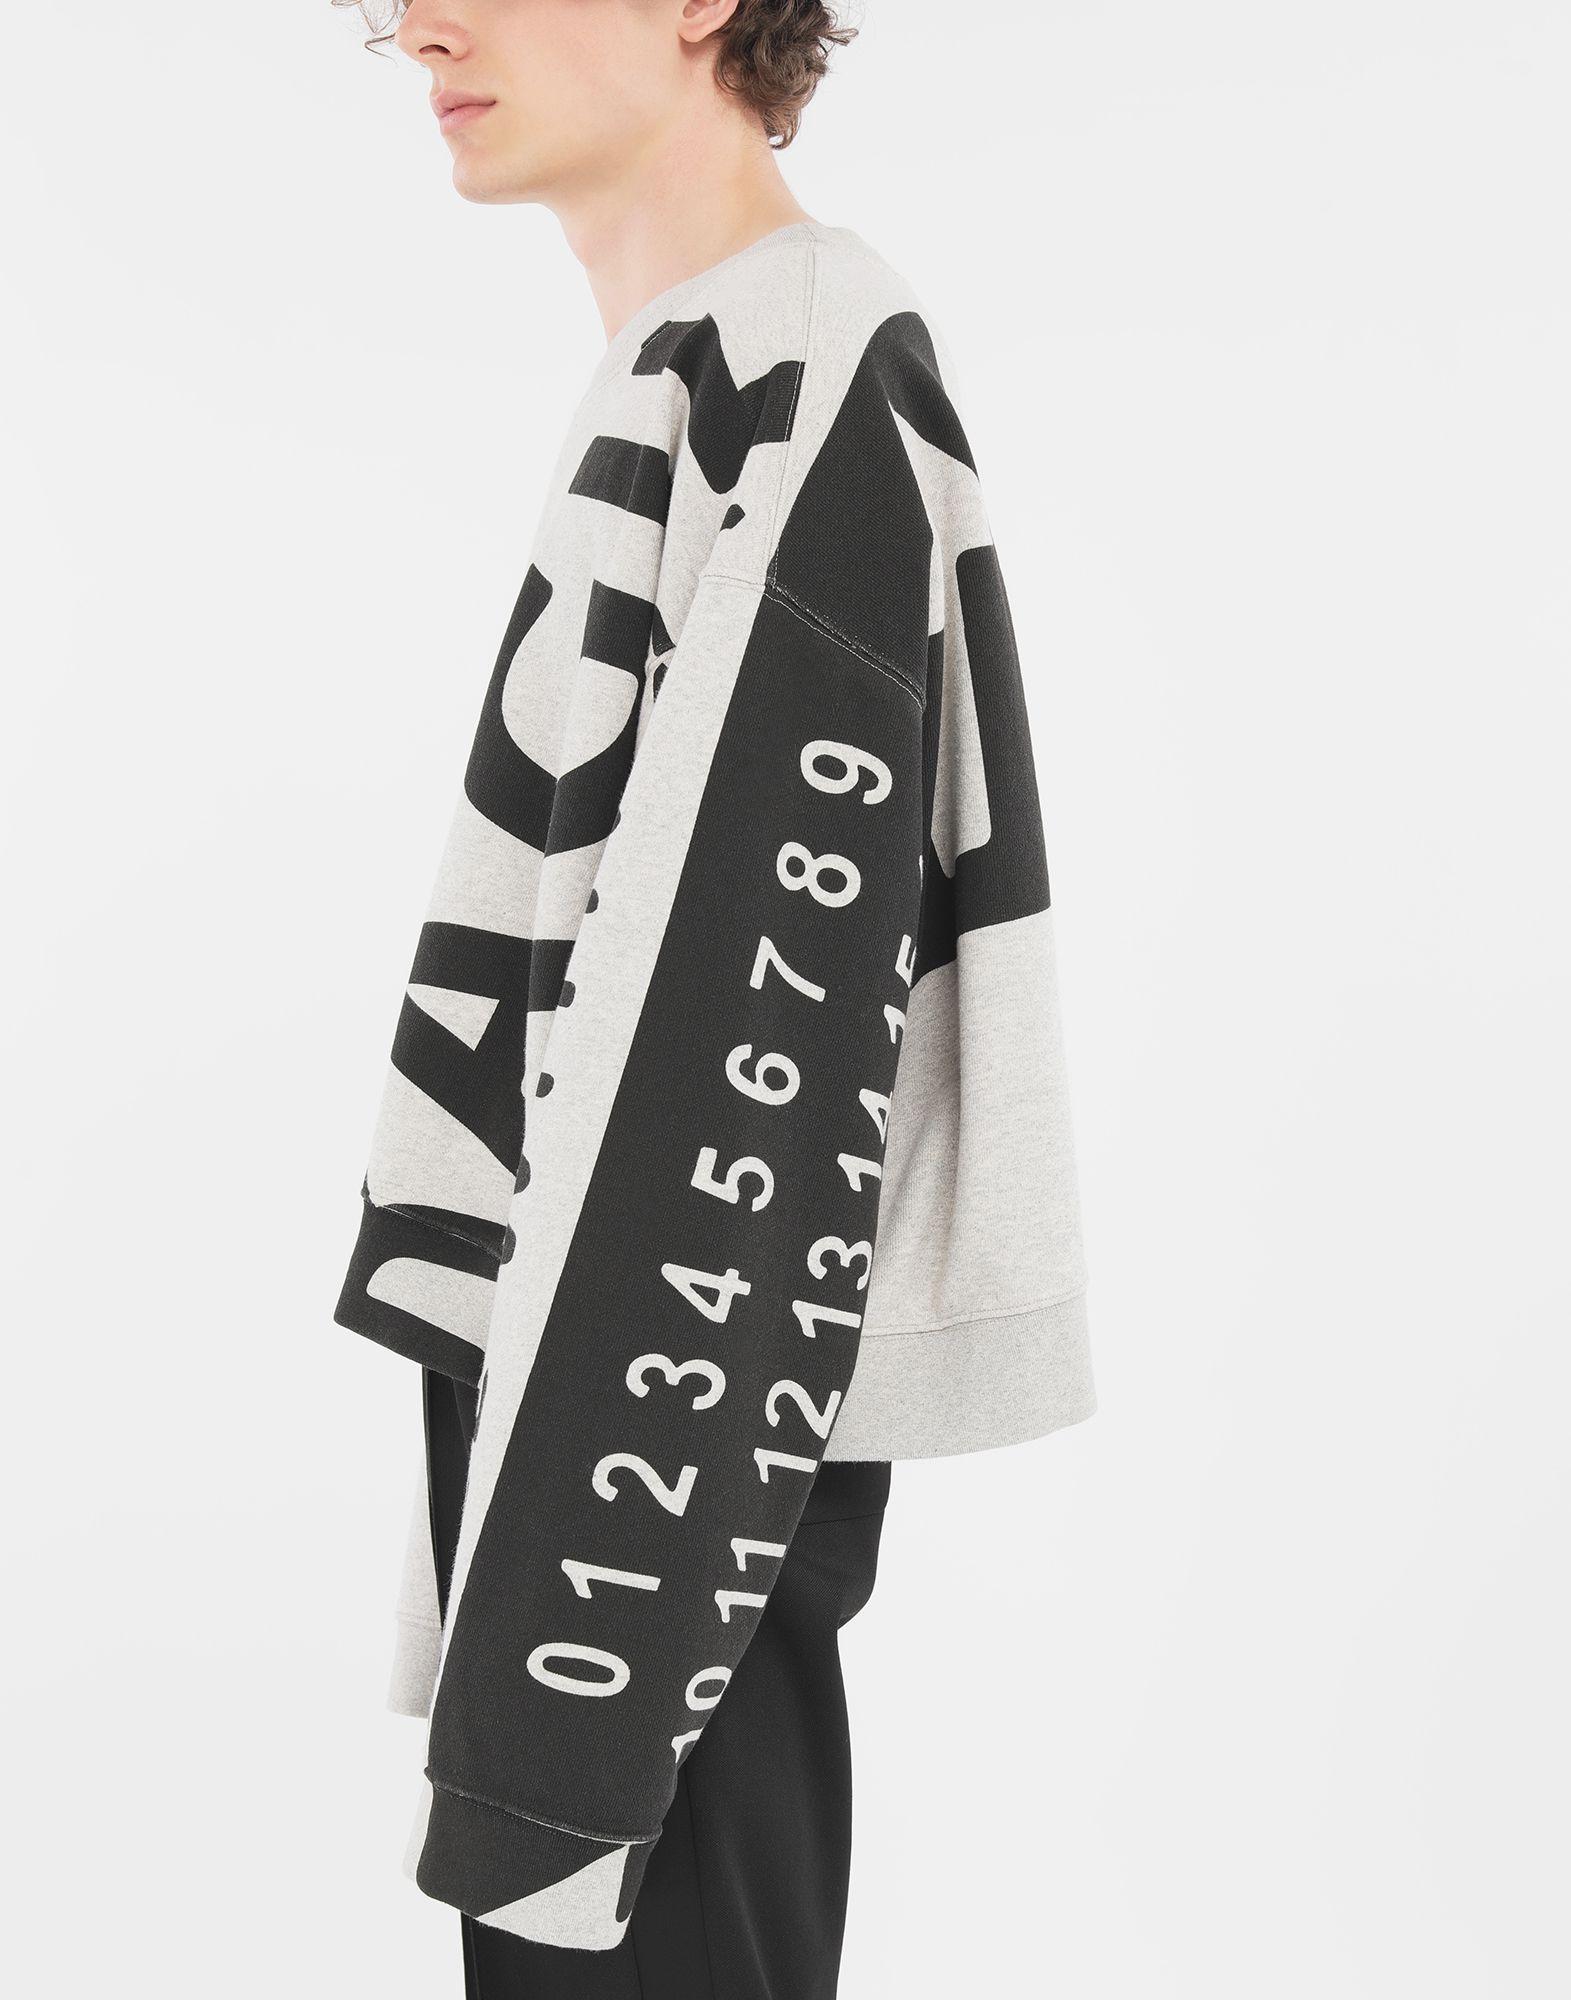 MAISON MARGIELA Sweatshirt 'Fragile' Sweatshirt Herr a